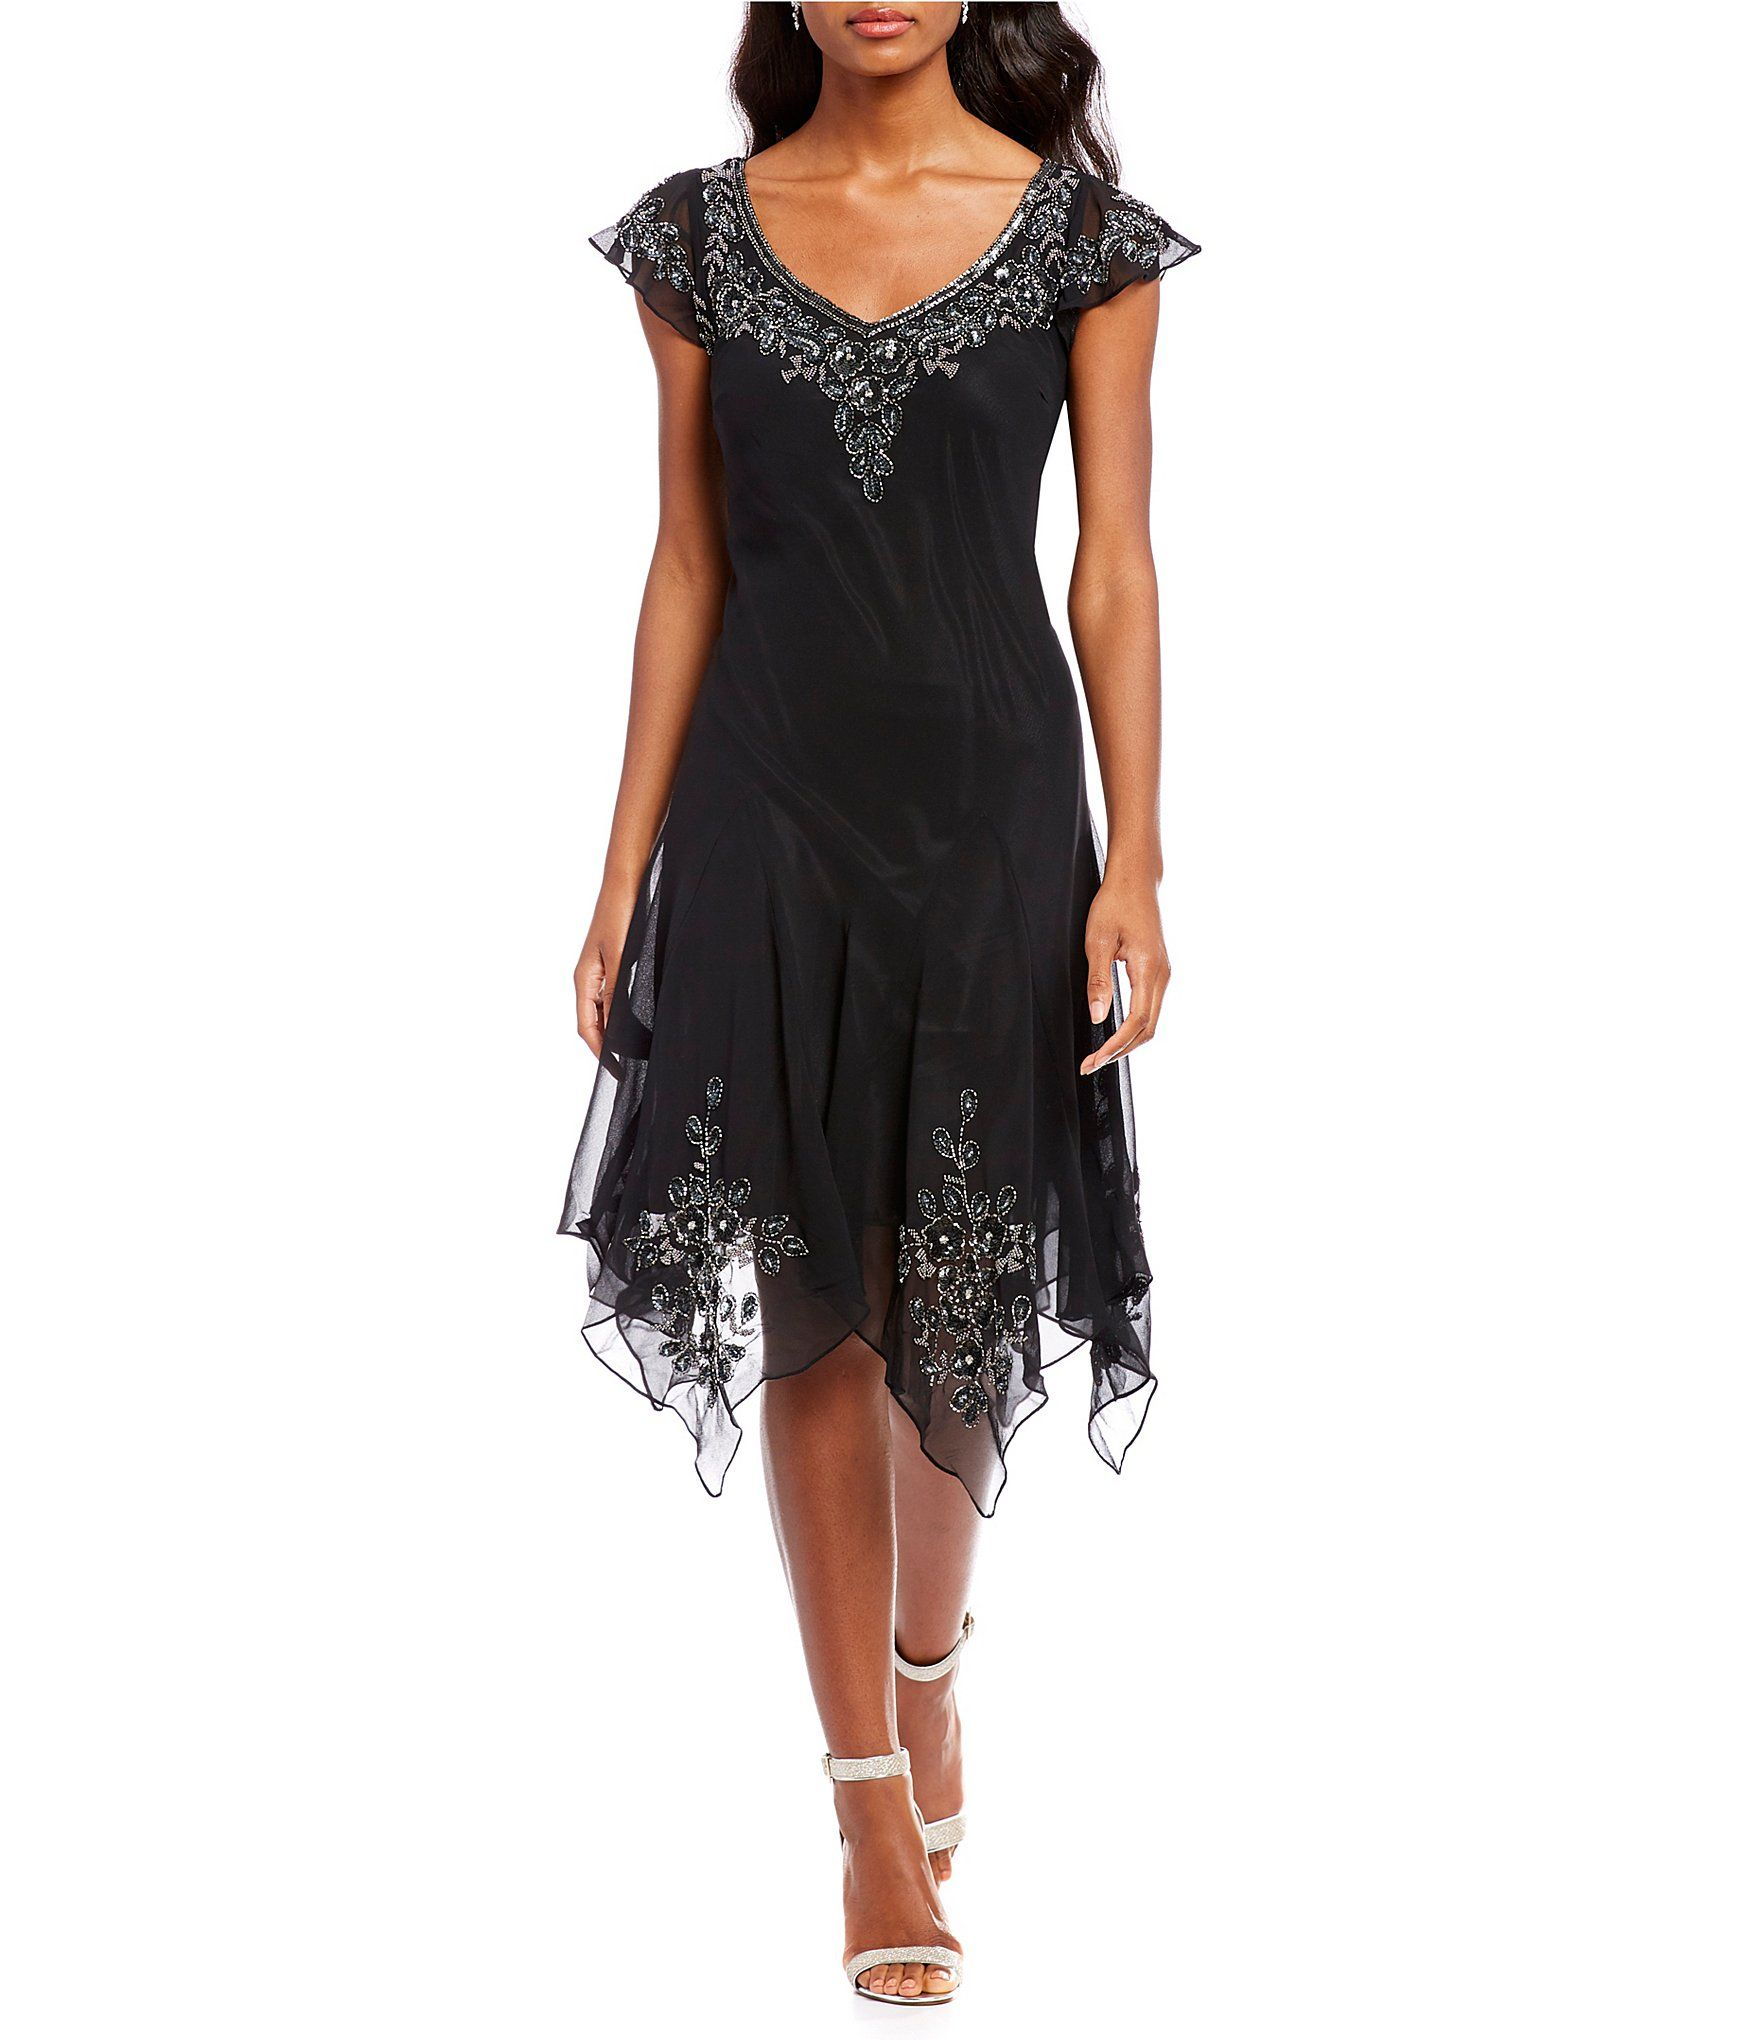 ed05371bd97f Petite Cocktail Dresses At Dillards